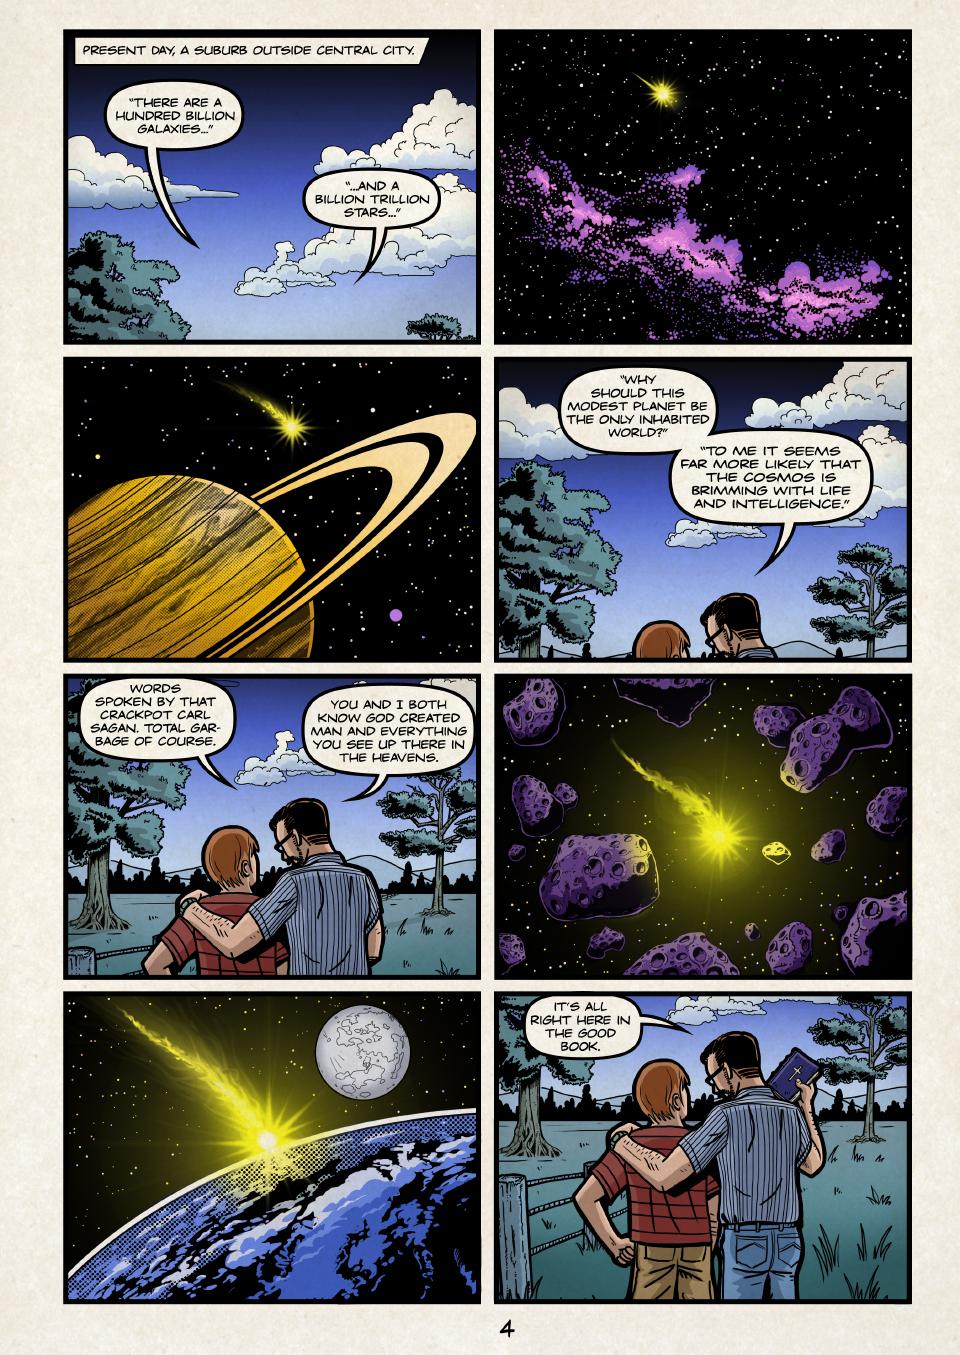 That crackpot Carl Sagan.